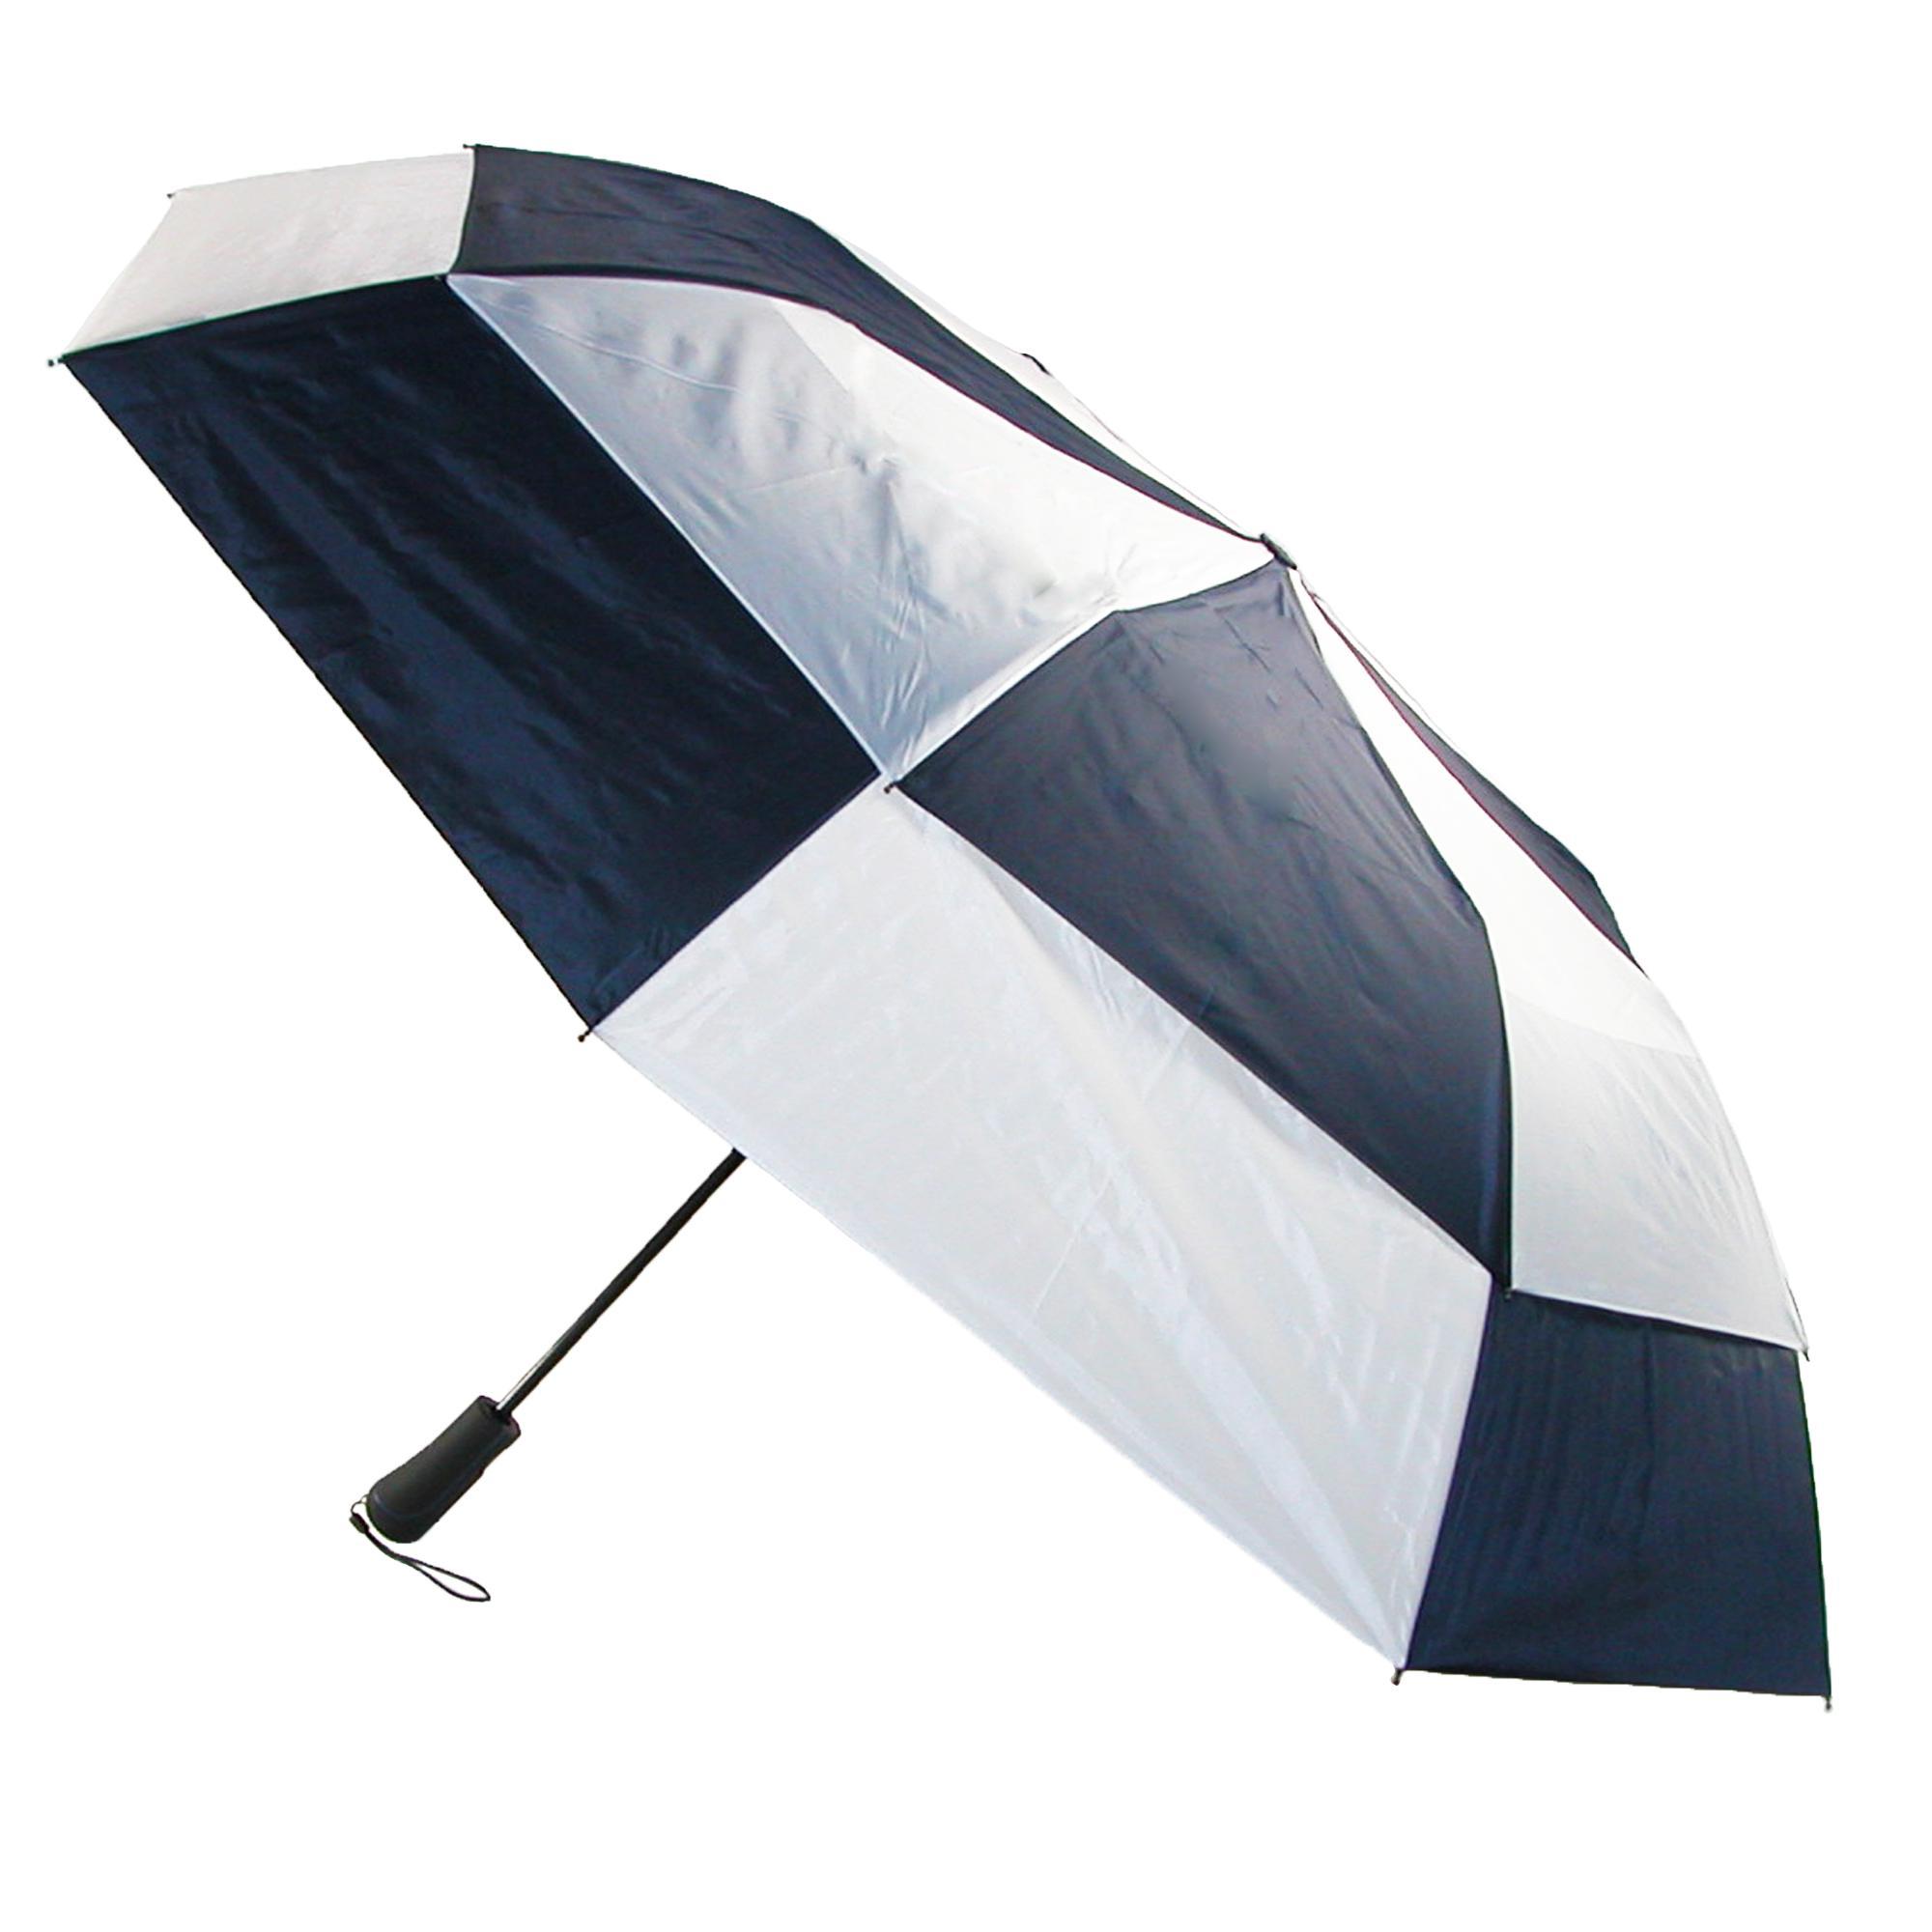 New totes men 39 s auto open vented split panel canopy for Canopy umbrella